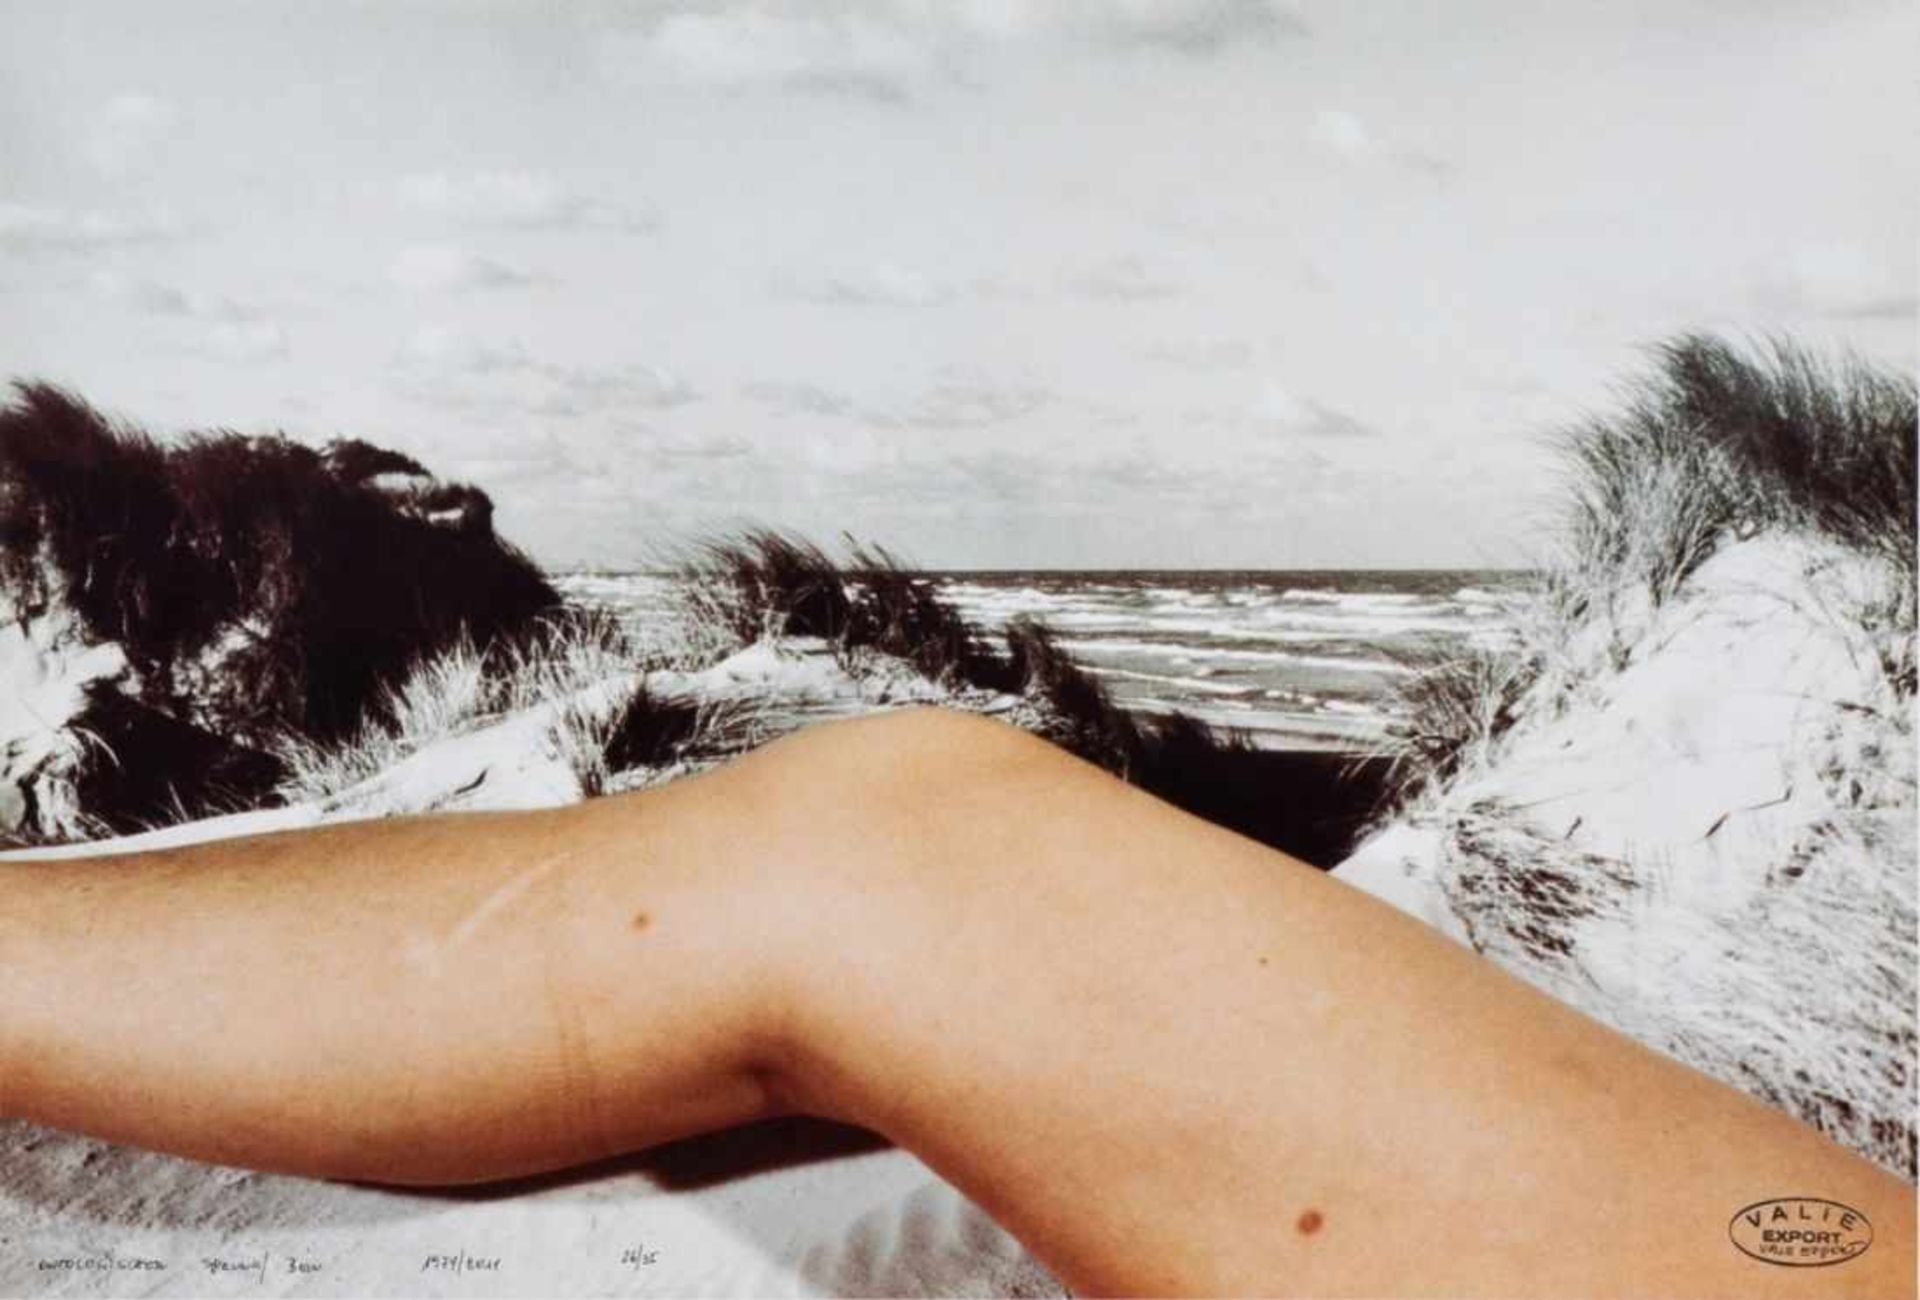 VALIE EXPORT(1940 LINZ)ONTOLOGISCHER SPRUNG/BEIN, 1974/2011Farbfotografie, 42 x 62 cm,